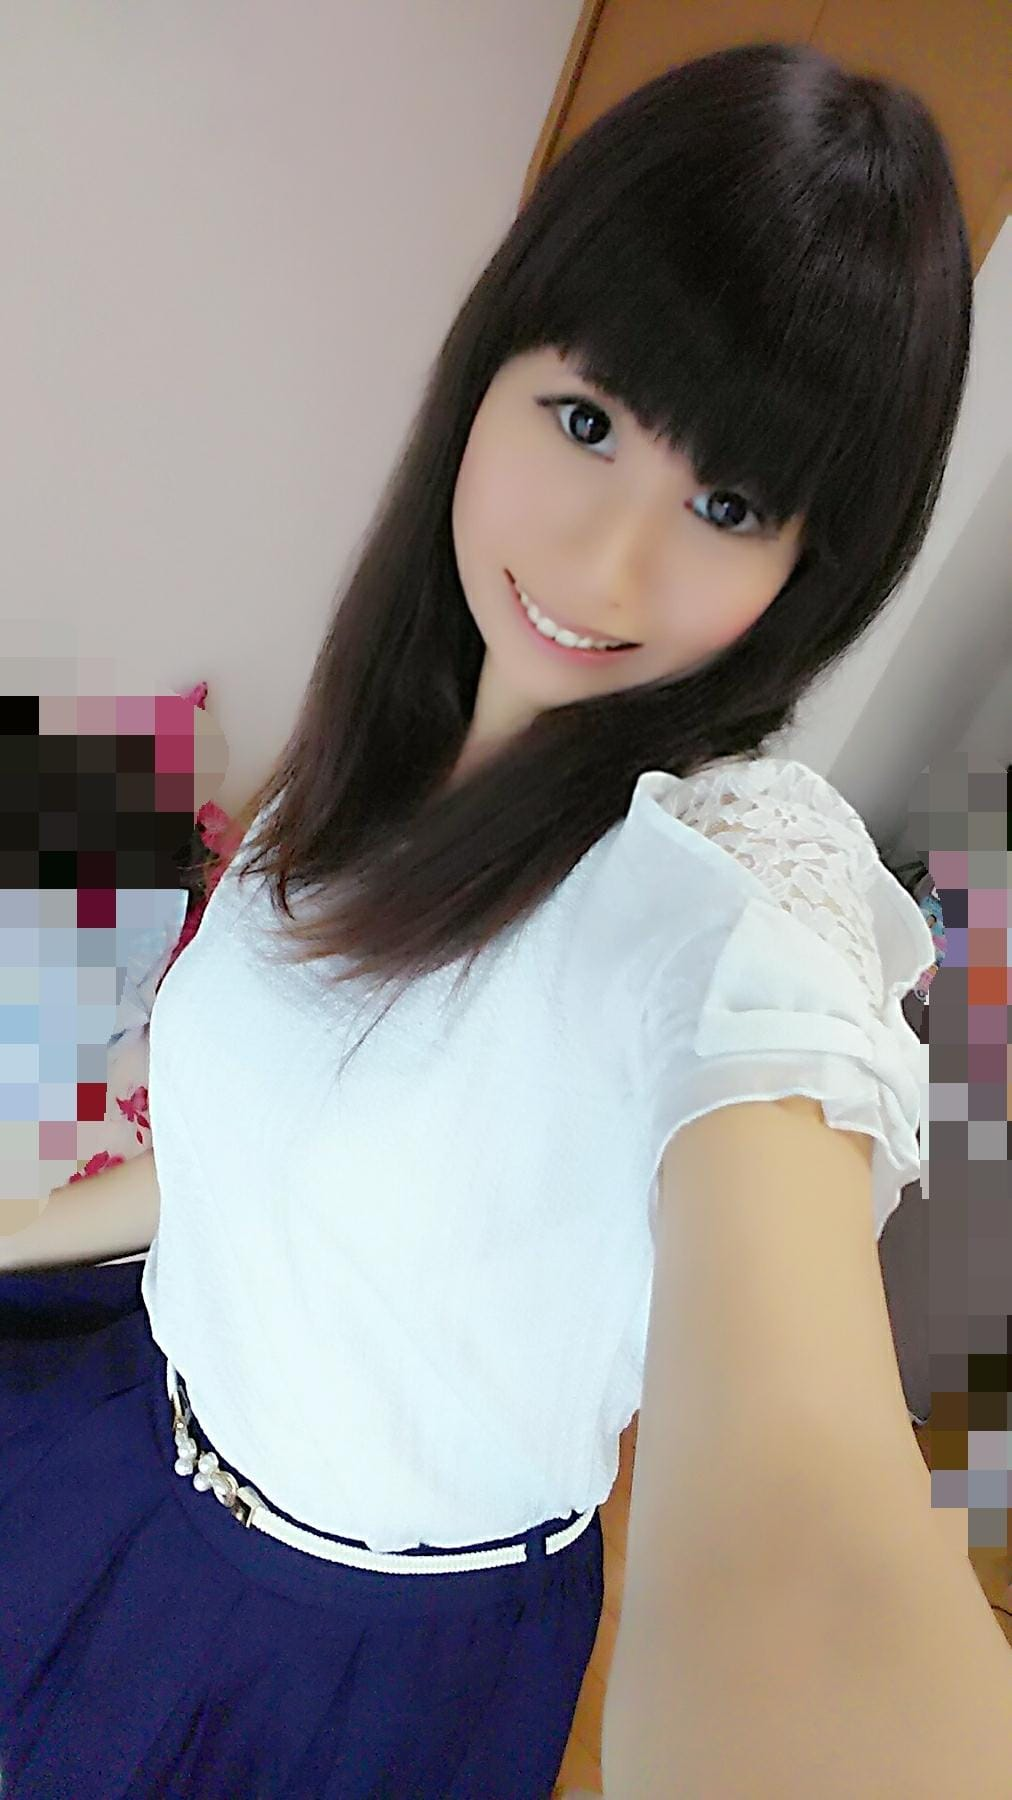 NH神月カレン「はじめまして(  ^∀^)」08/18(土) 20:40   NH神月カレンの写メ・風俗動画